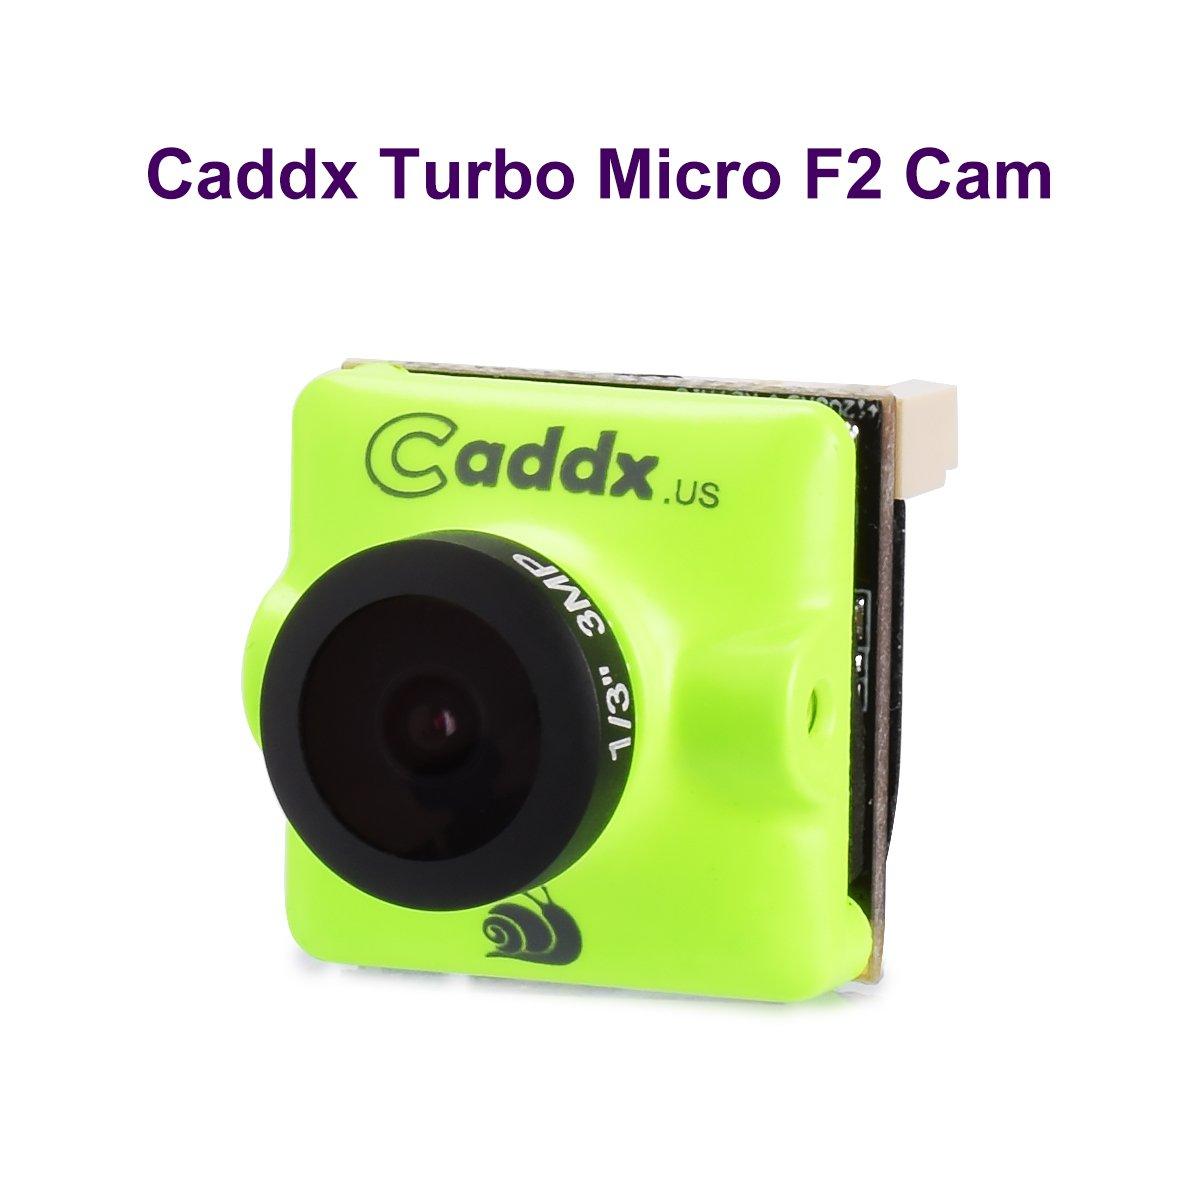 FPV Camera Caddx Turbo Micro F2 1200TVL 2.1mm Cam 1/3'' CMOS 16:9 NTSC PAL Switchable 2.1mm IR Blocked Green for FPV Racing Drone by Caddx